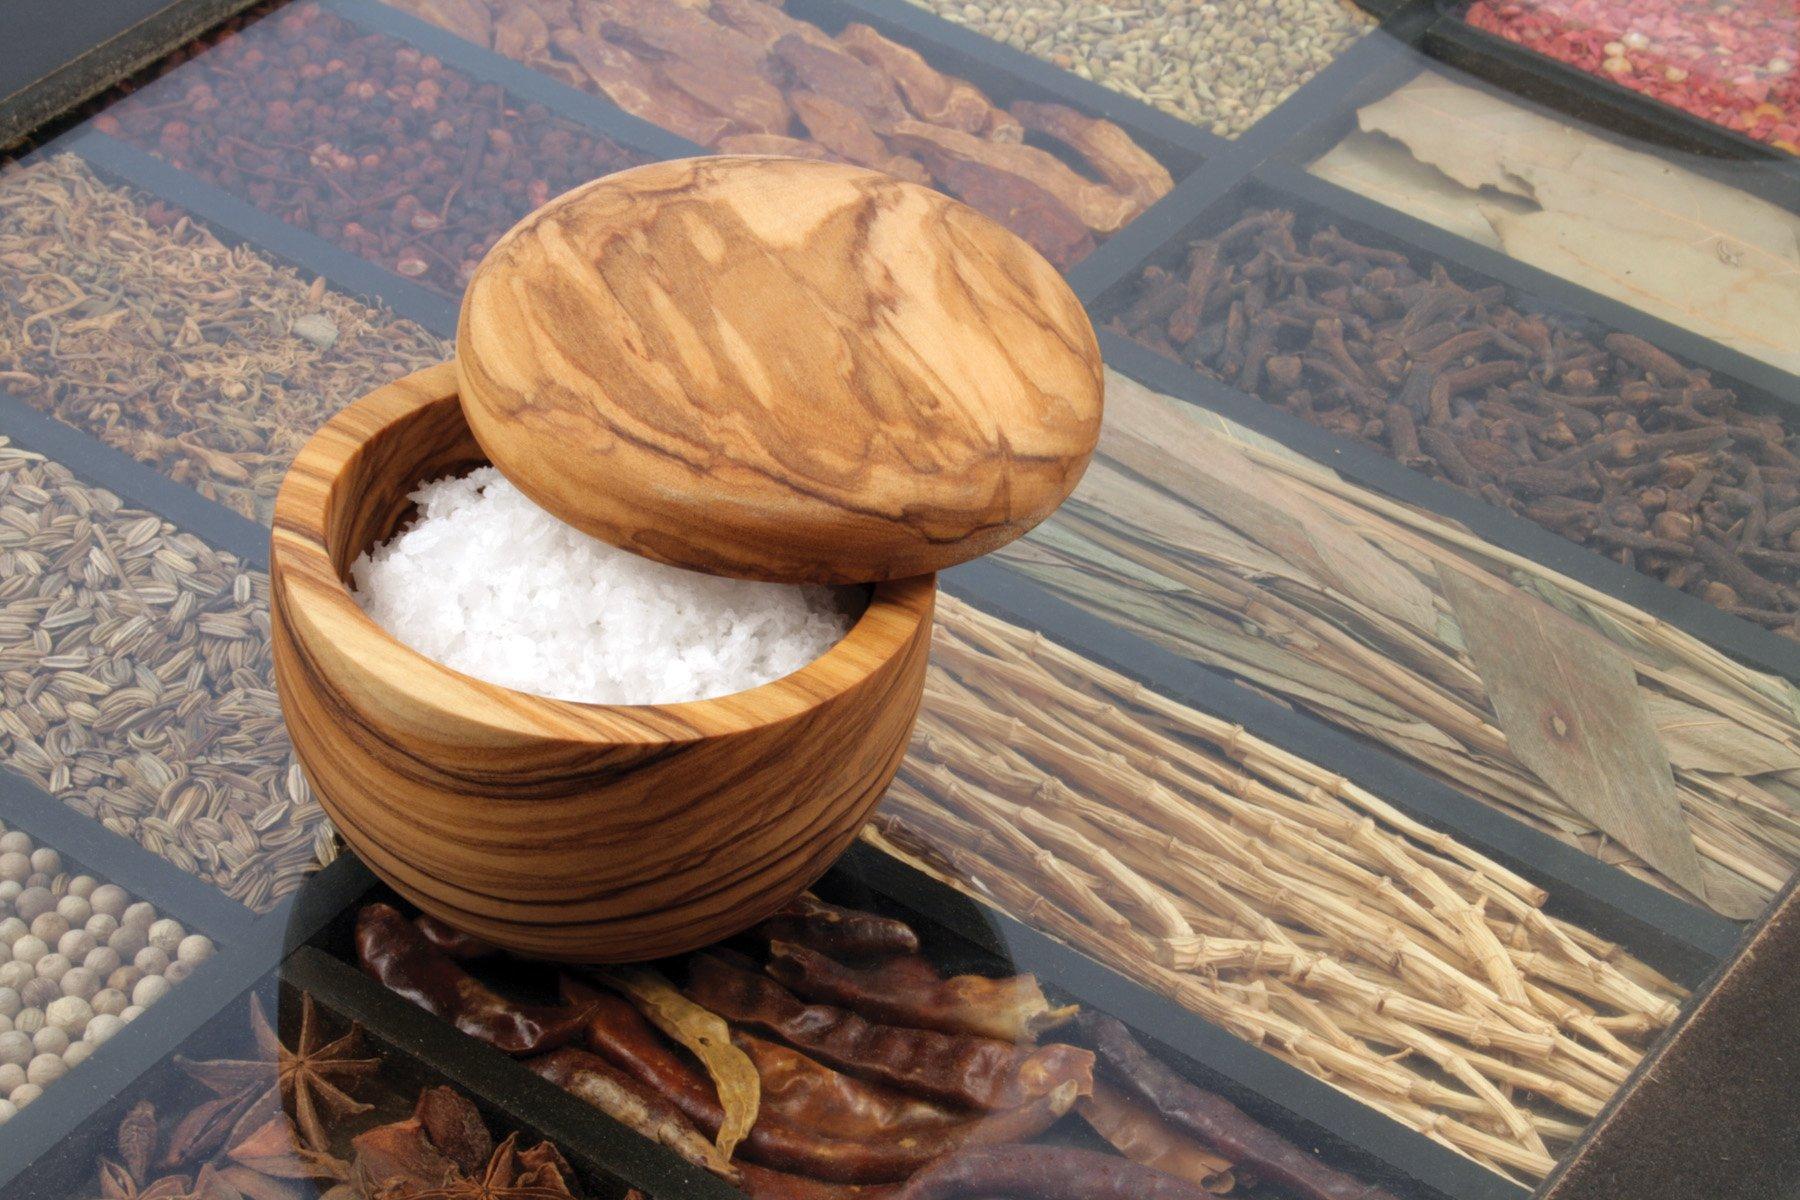 Swissmar Napoli Salt Keeper with Removable Lid, Olive Wood by Swissmar (Image #3)